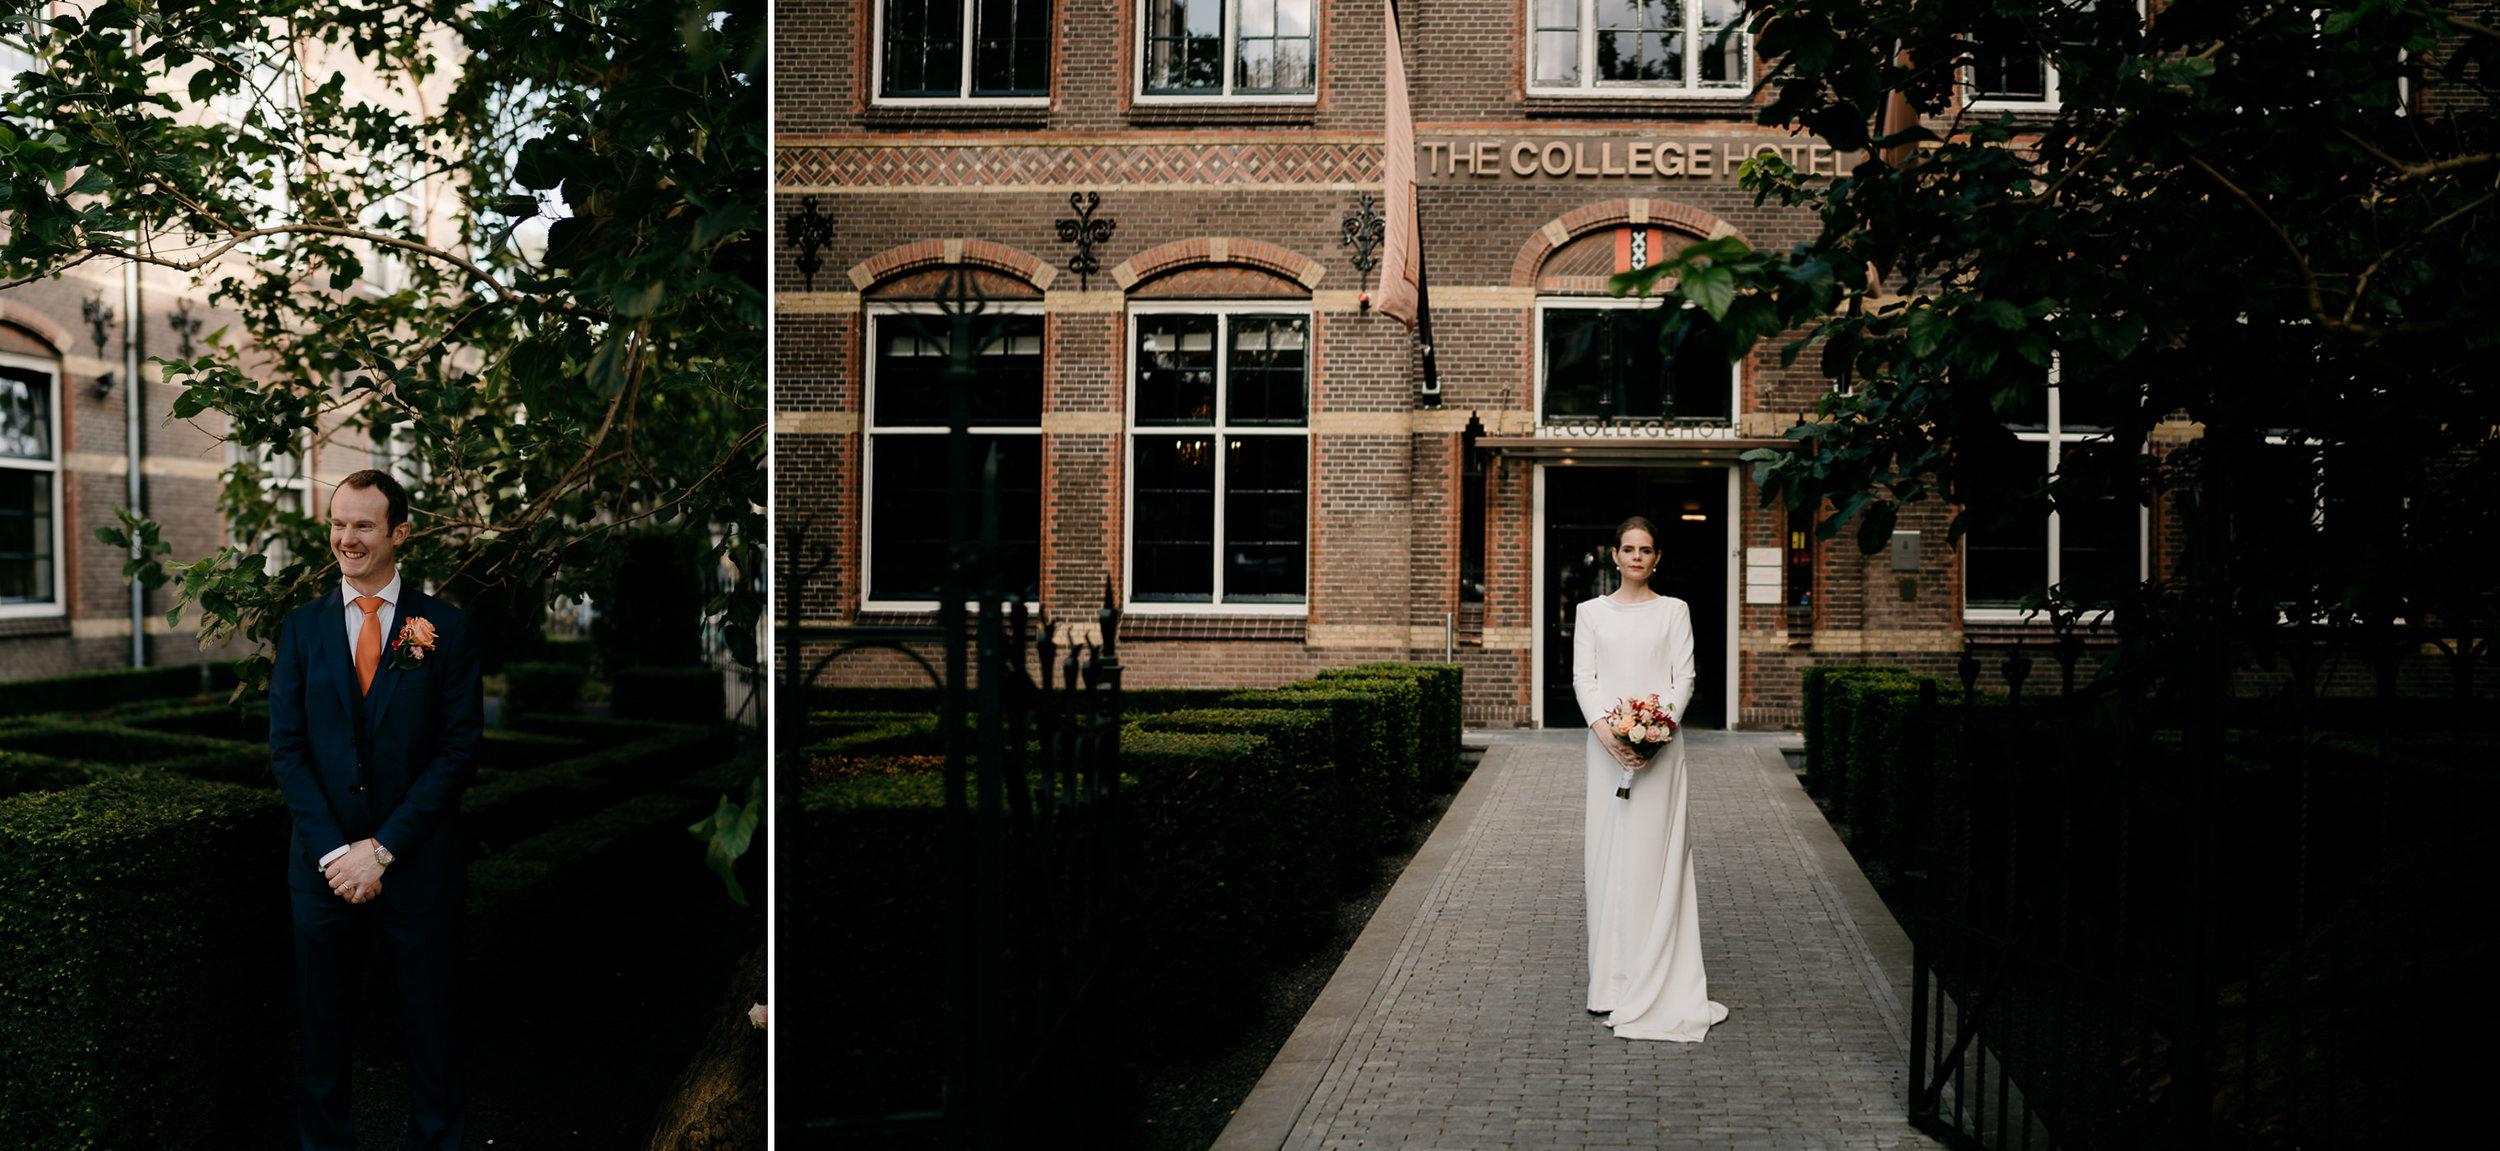 bruidsfotografie-trouwfotograaf-wedding-photographer-amsterdam-James-Jantine-257 copy.jpg